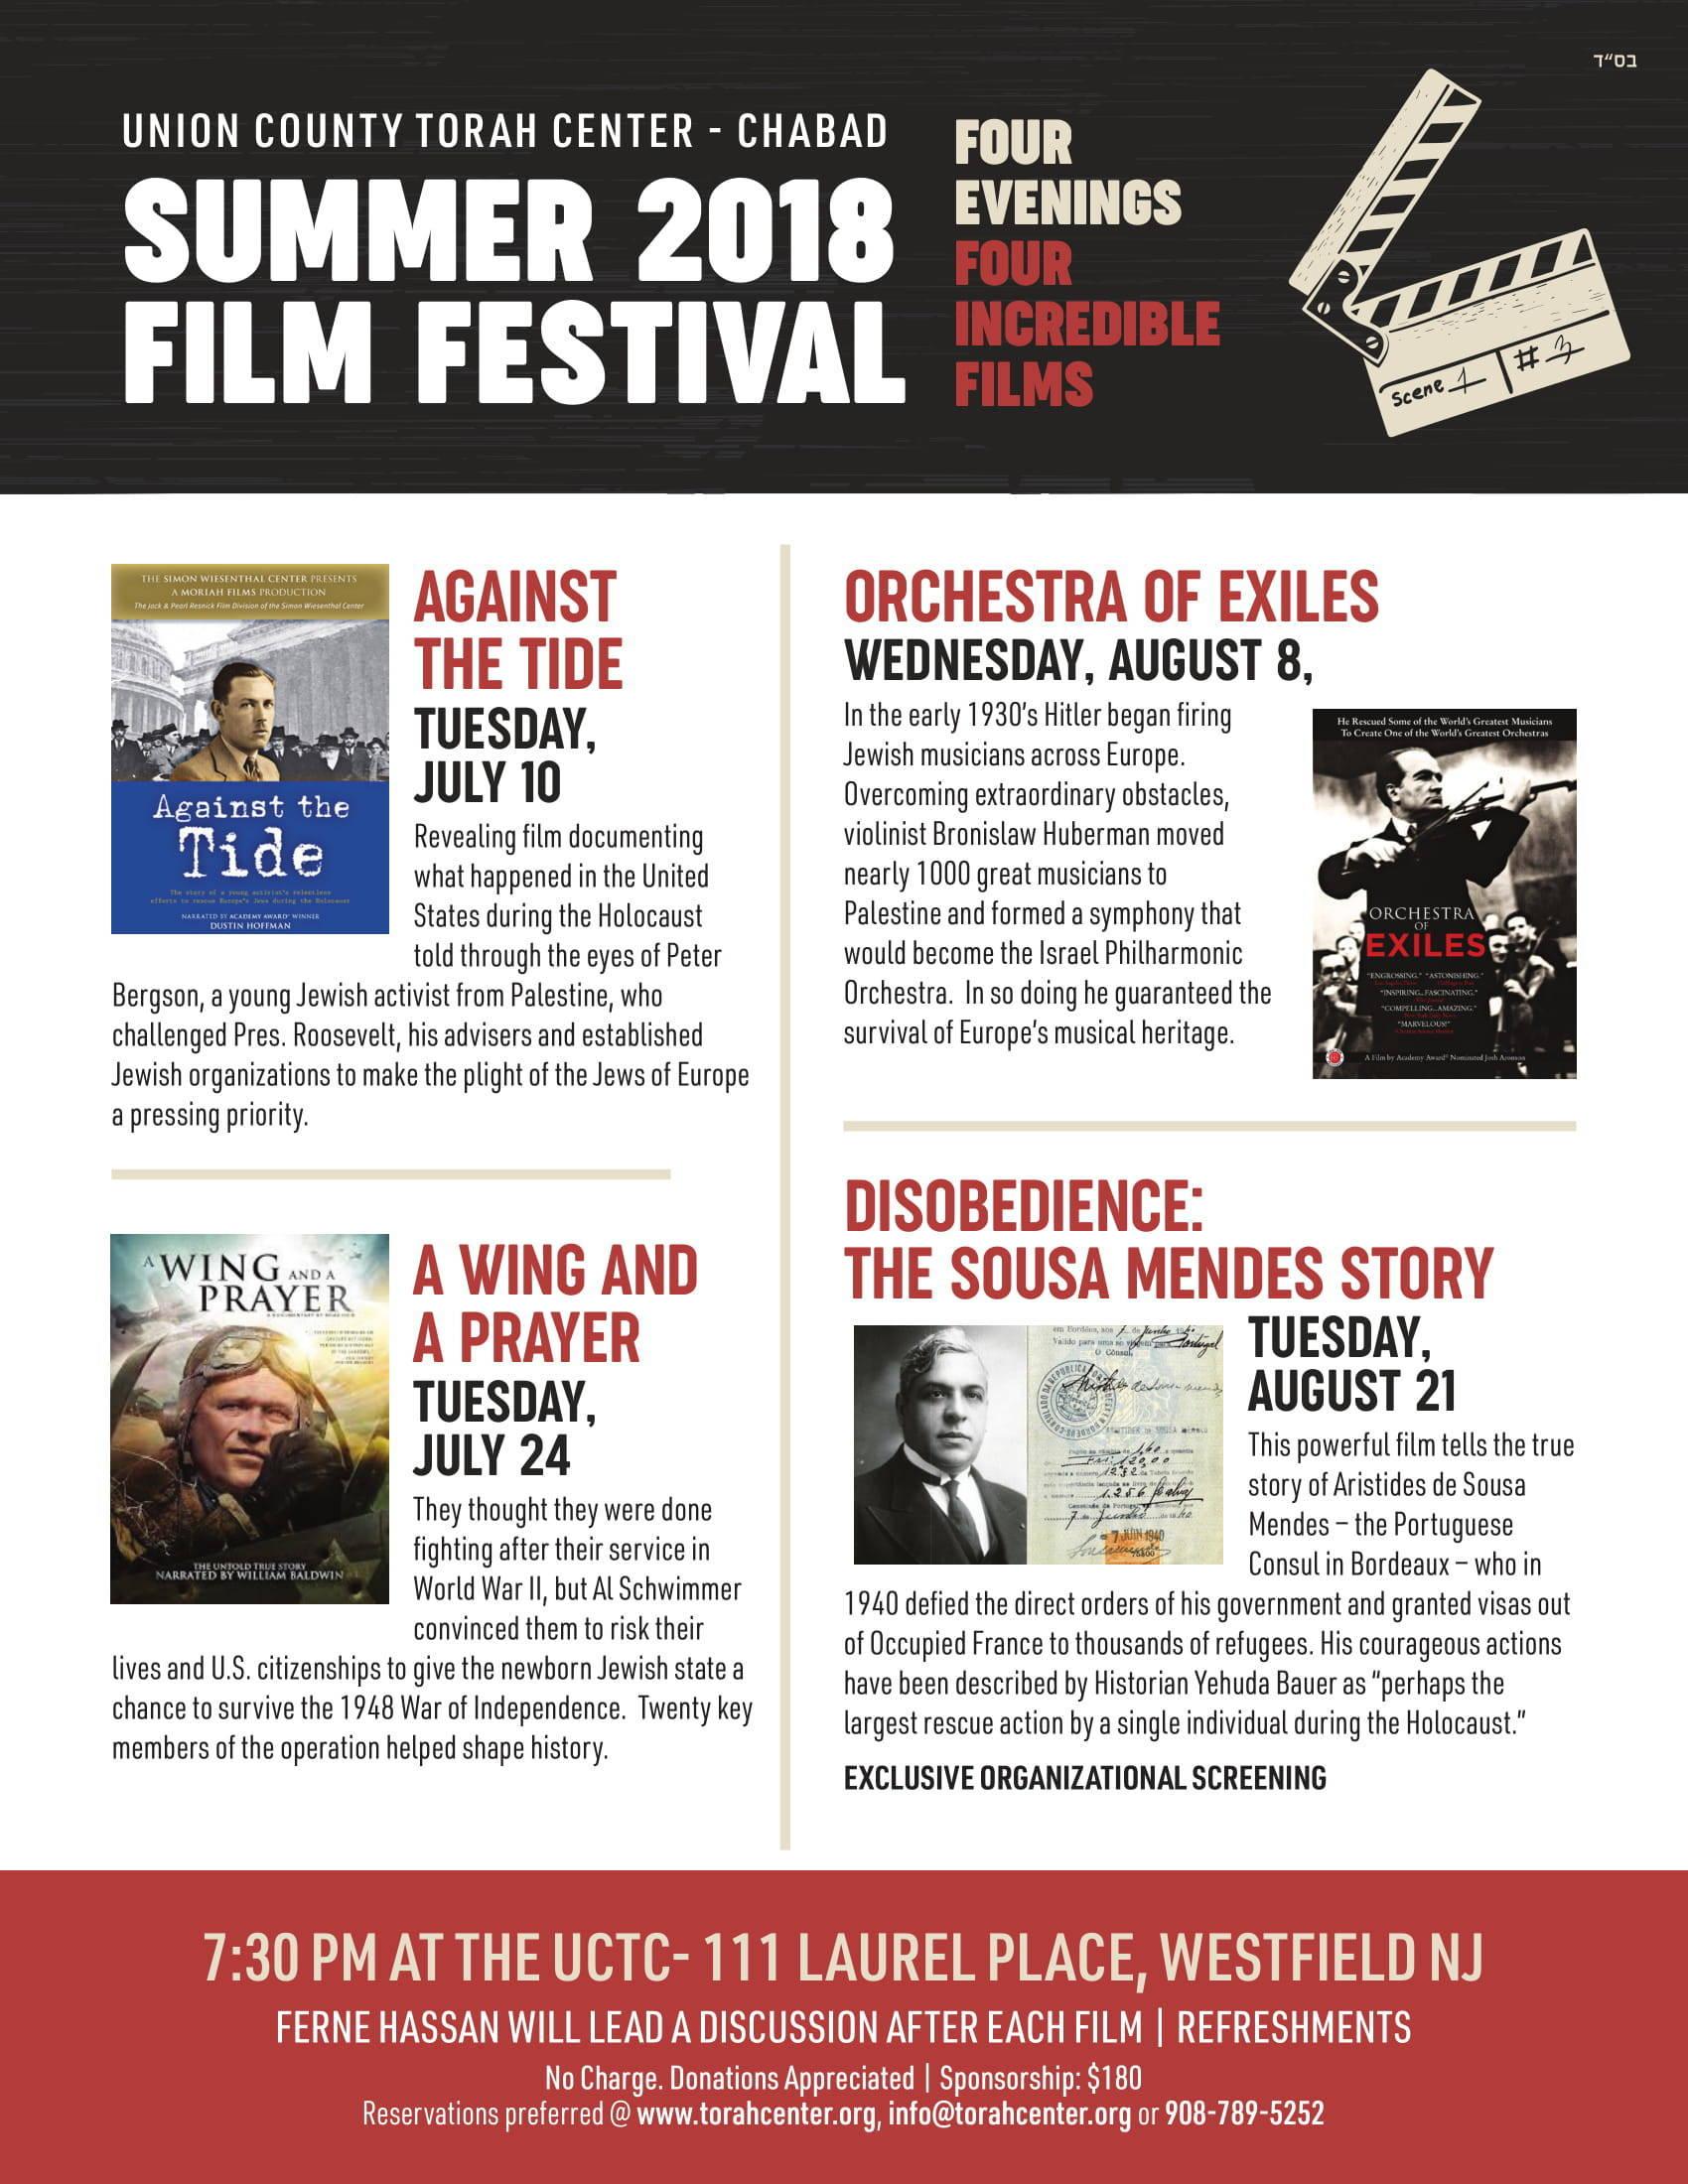 Torah Center-Chabad Summer 2018 Film Festival | TAPinto